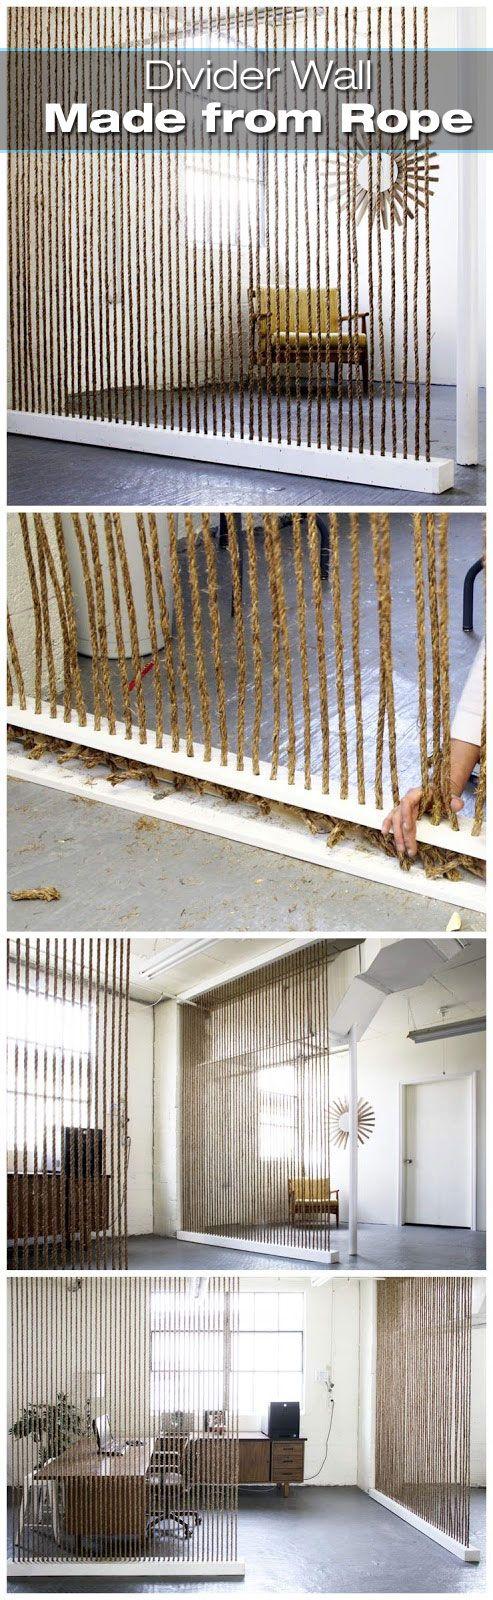 Diy room dividers - Creative Rope Divider Wall